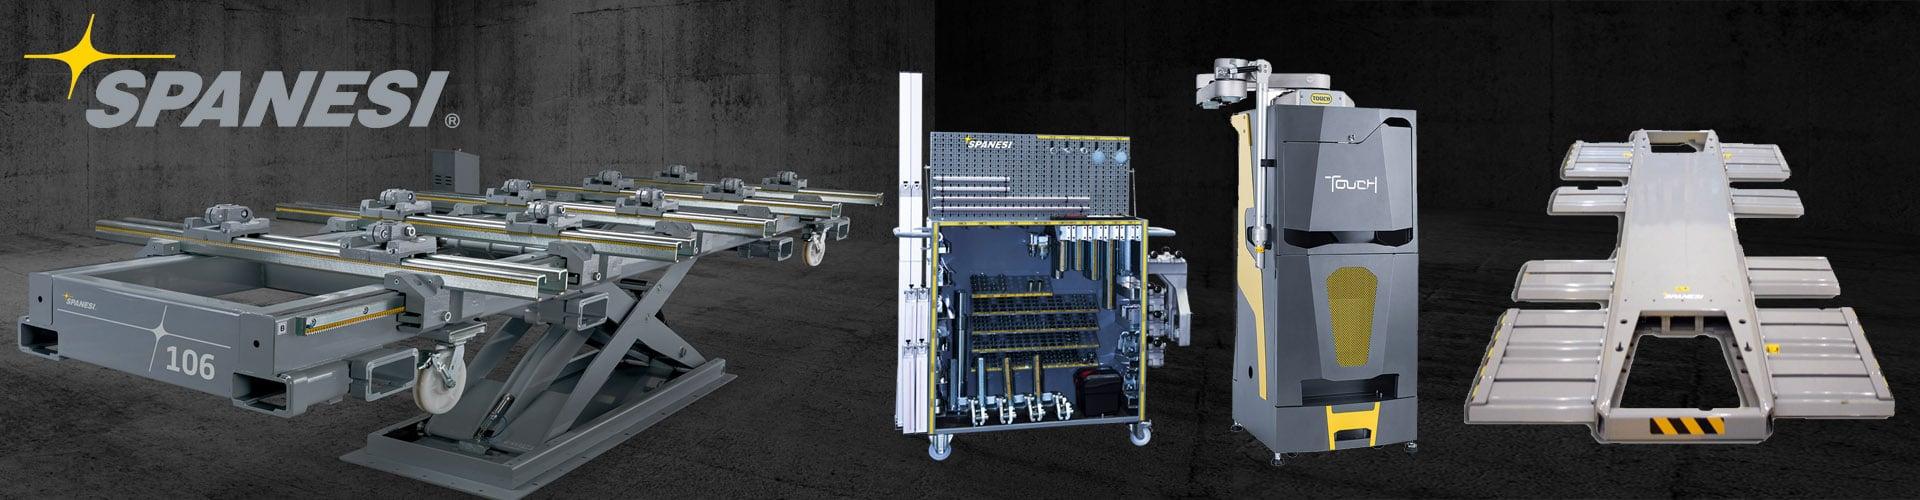 Spanesi Auto Body Equipment